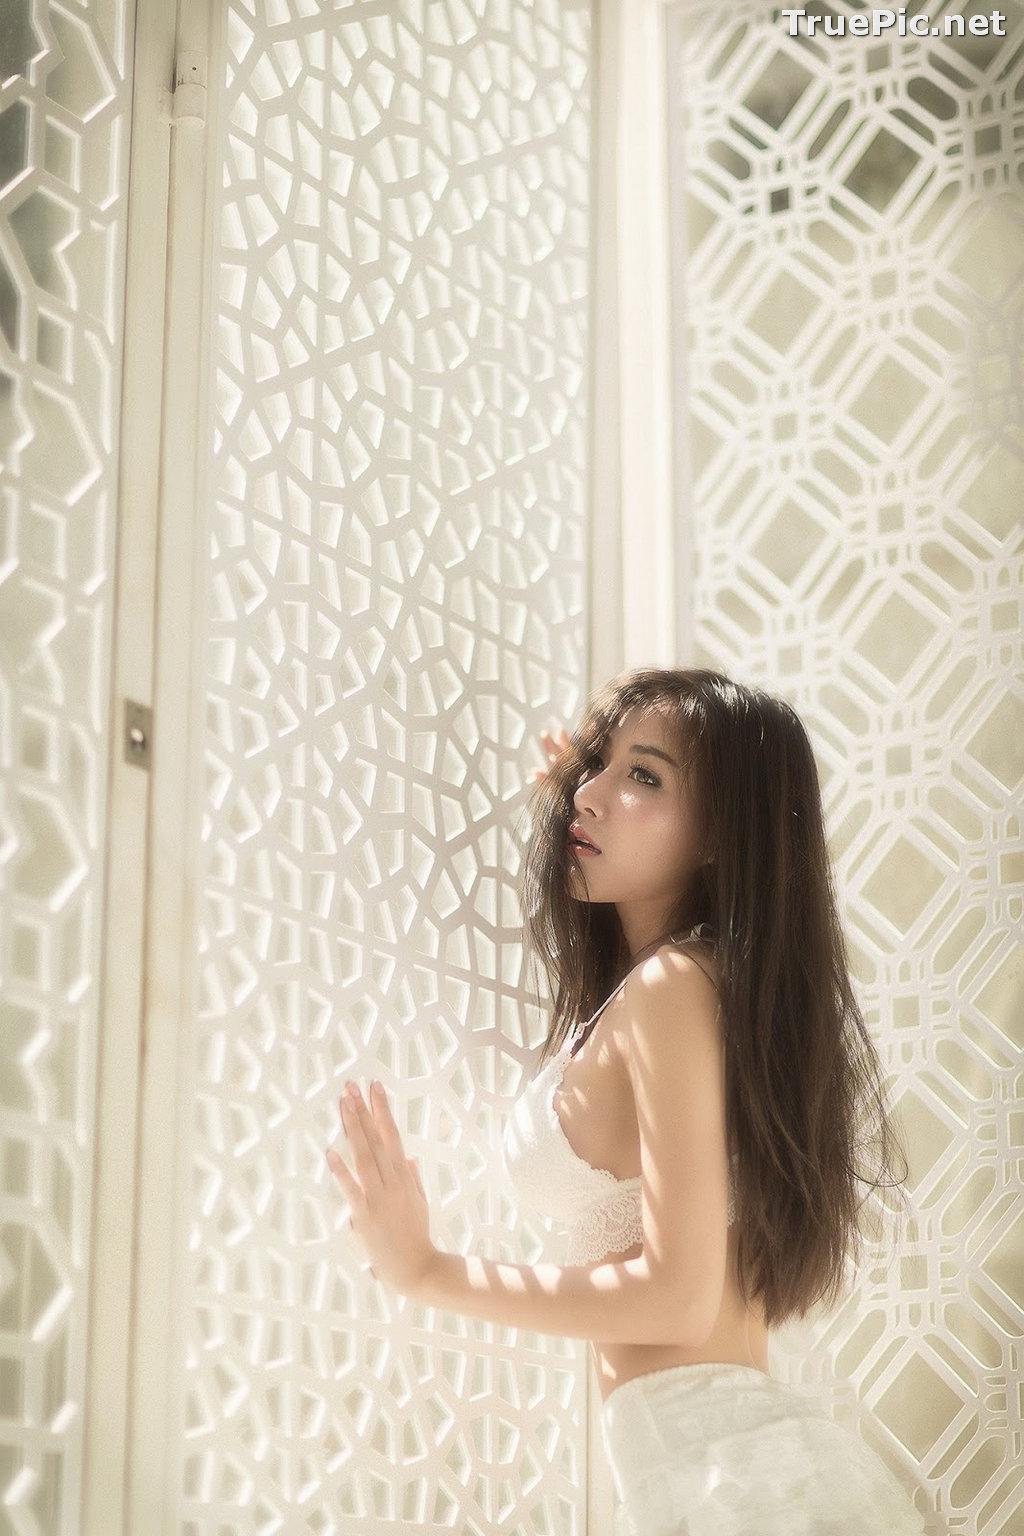 Image Thailand Model - Chotip Kungnang Jandahan - Concept Mini Sexy - TruePic.net - Picture-3